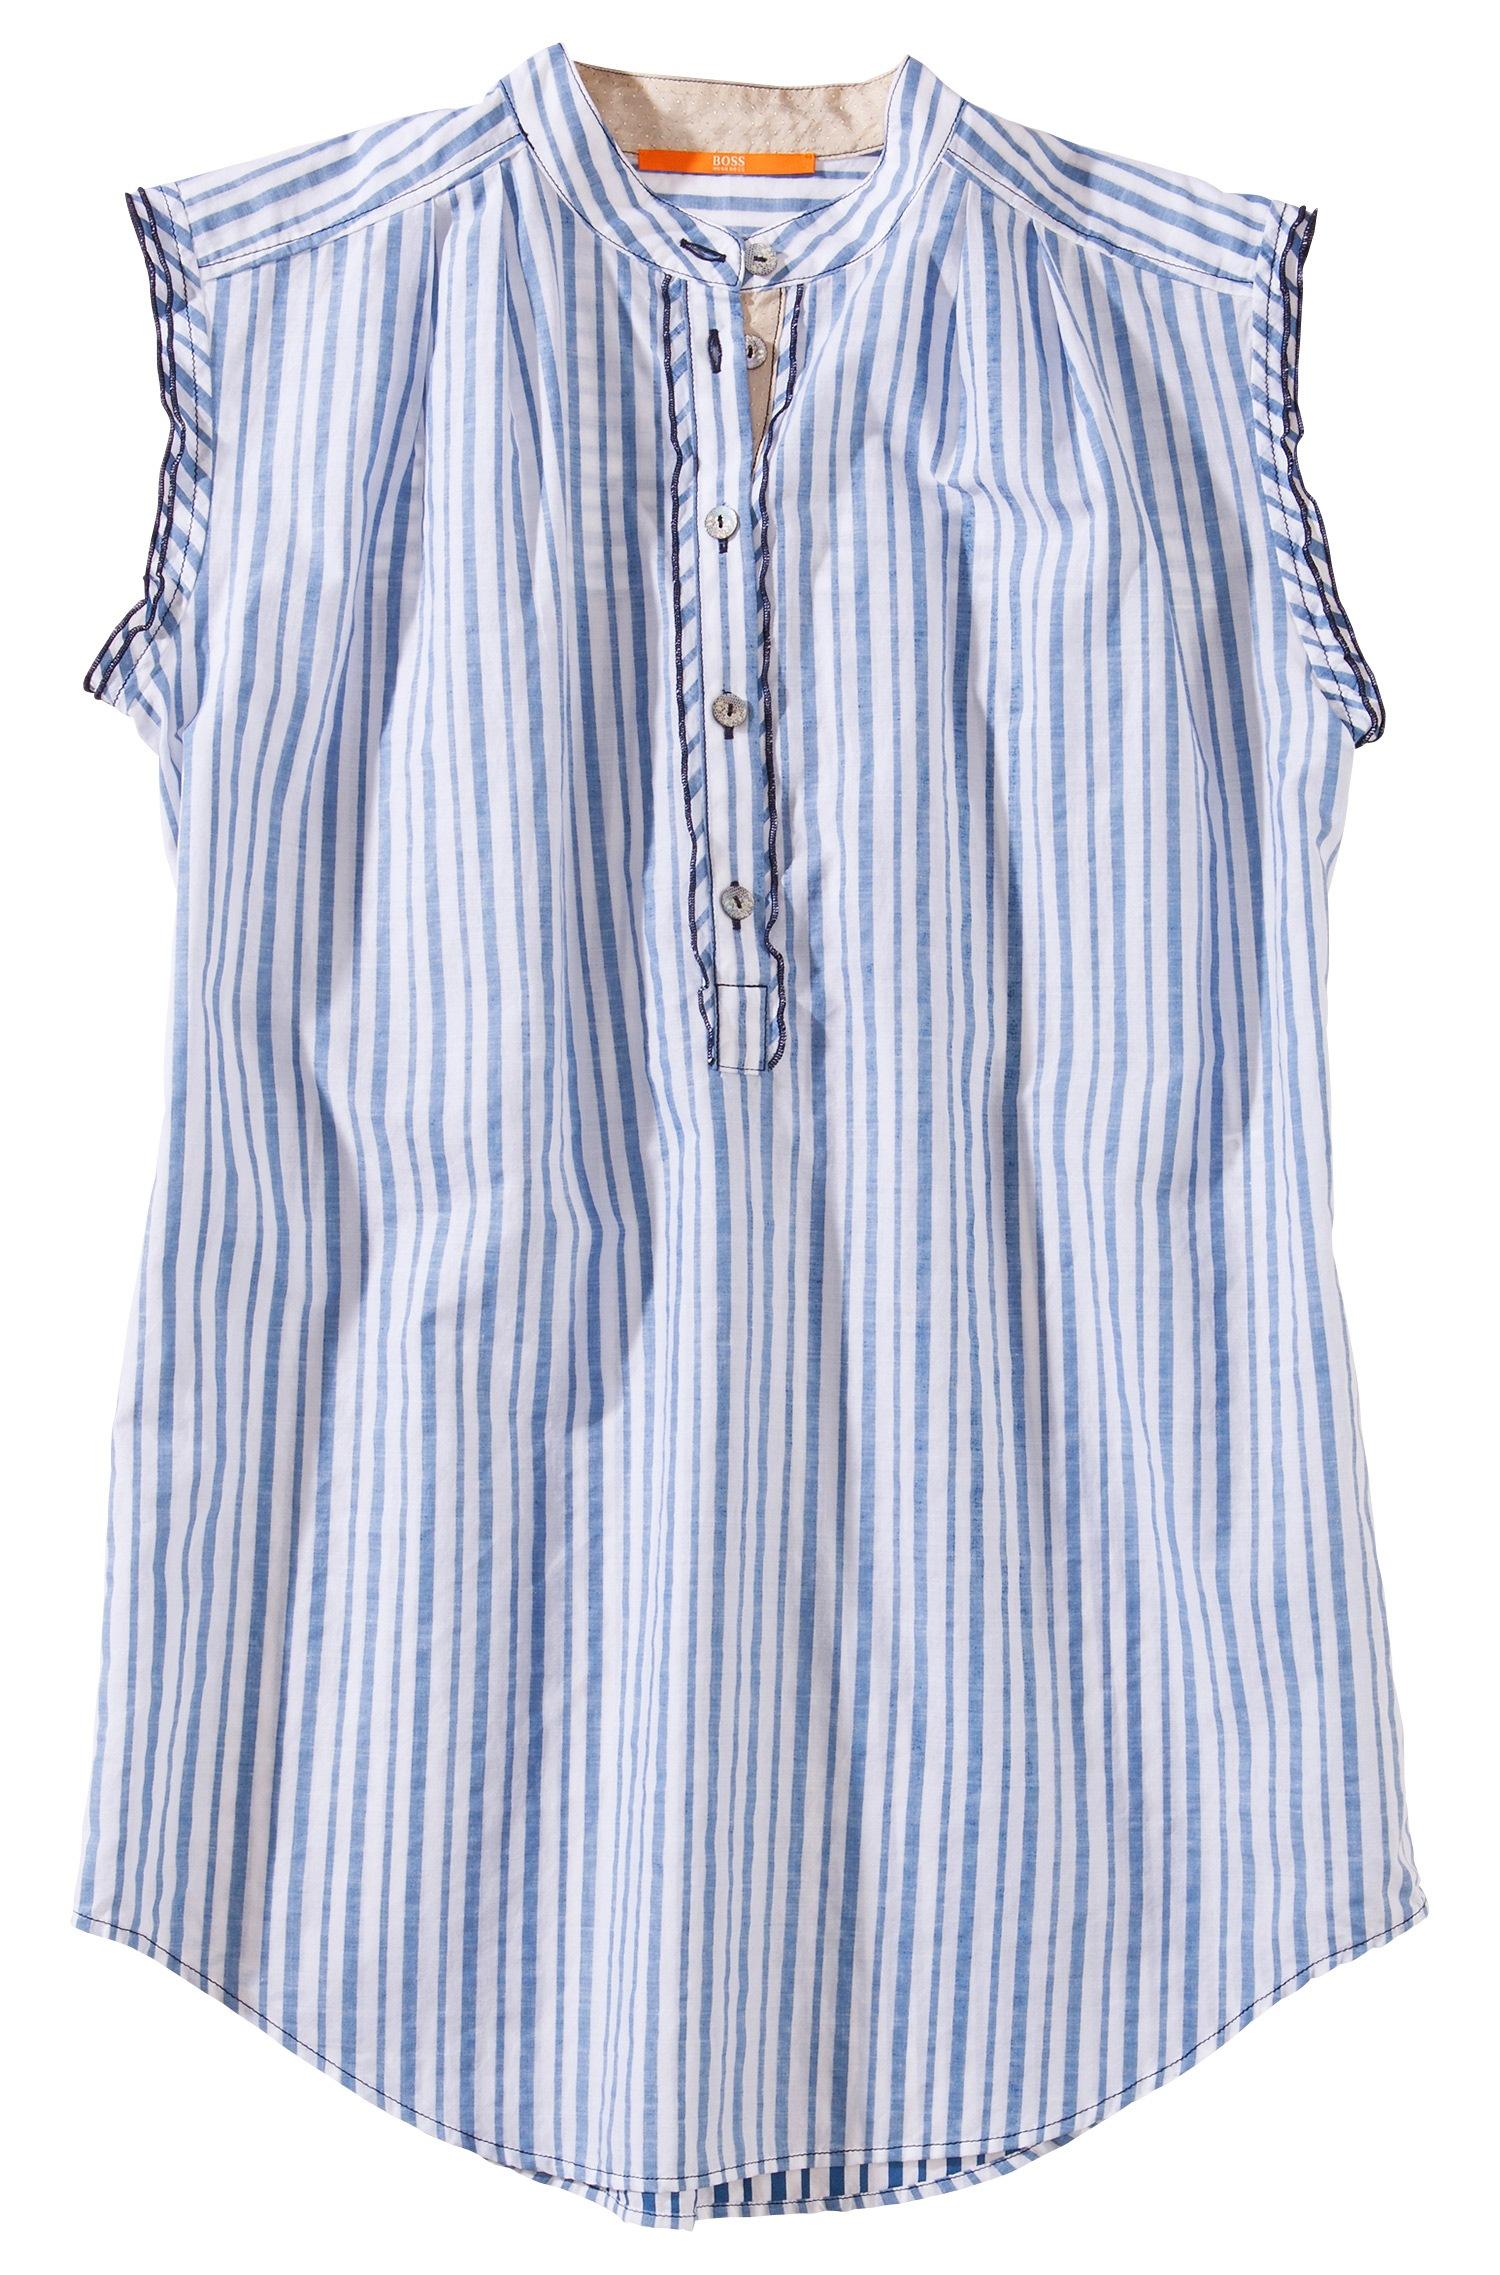 lyst boss orange sleeveless blouse cacitane in cotton in blue. Black Bedroom Furniture Sets. Home Design Ideas